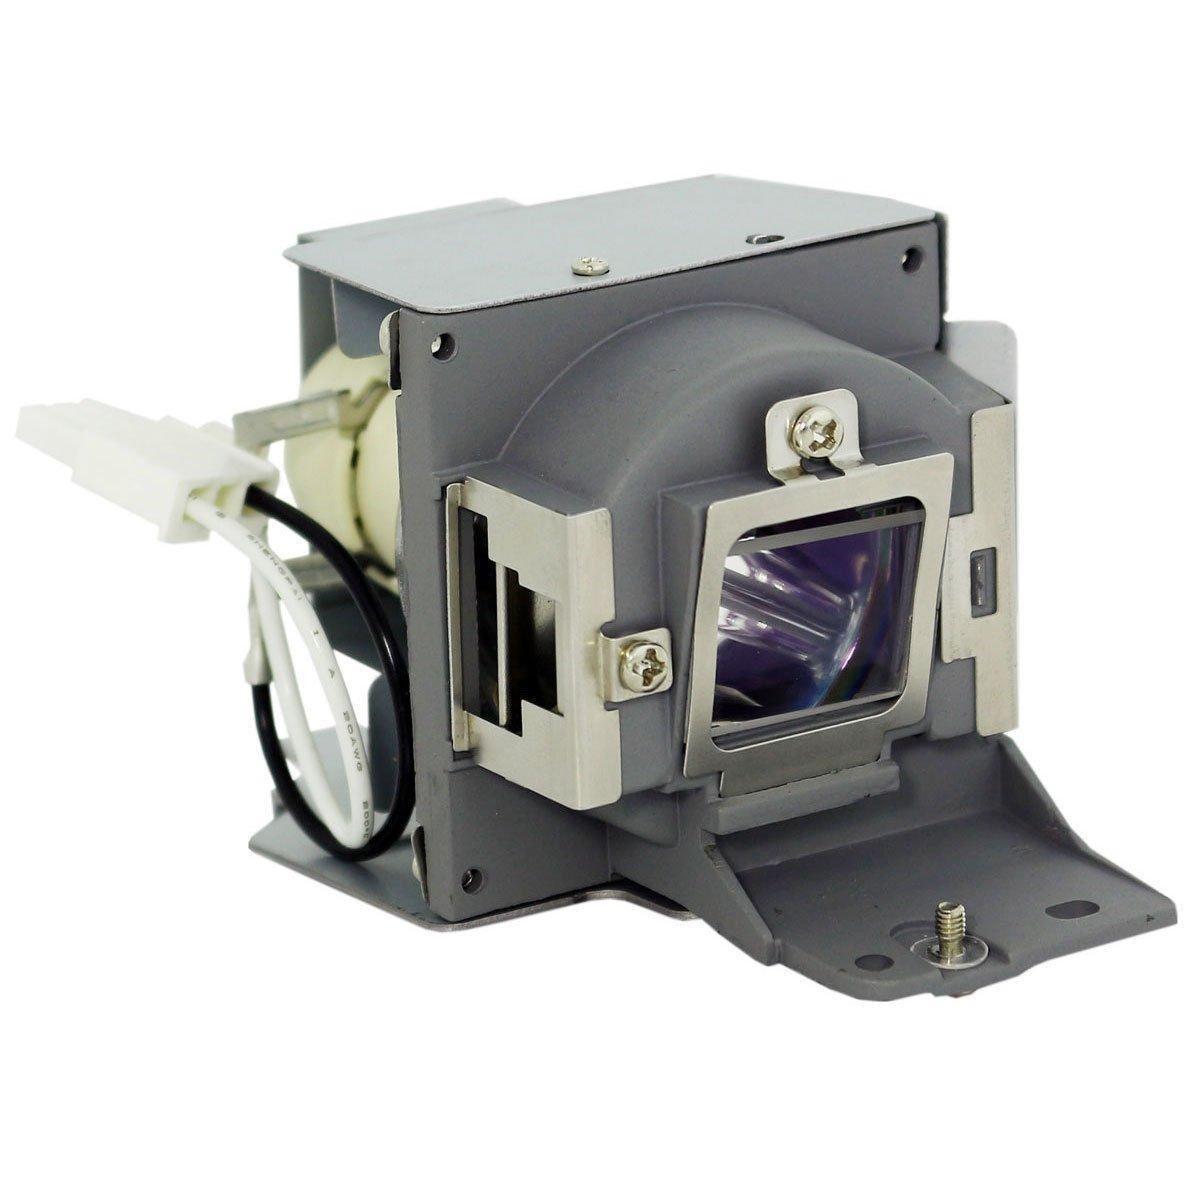 Compatible Projector lamp BENQ 5J.J7C05.001/MX815PST/MX815ST/MX816ST/MX815ST+ набор 033 3 лака 7 мл vinyl 815 816 822